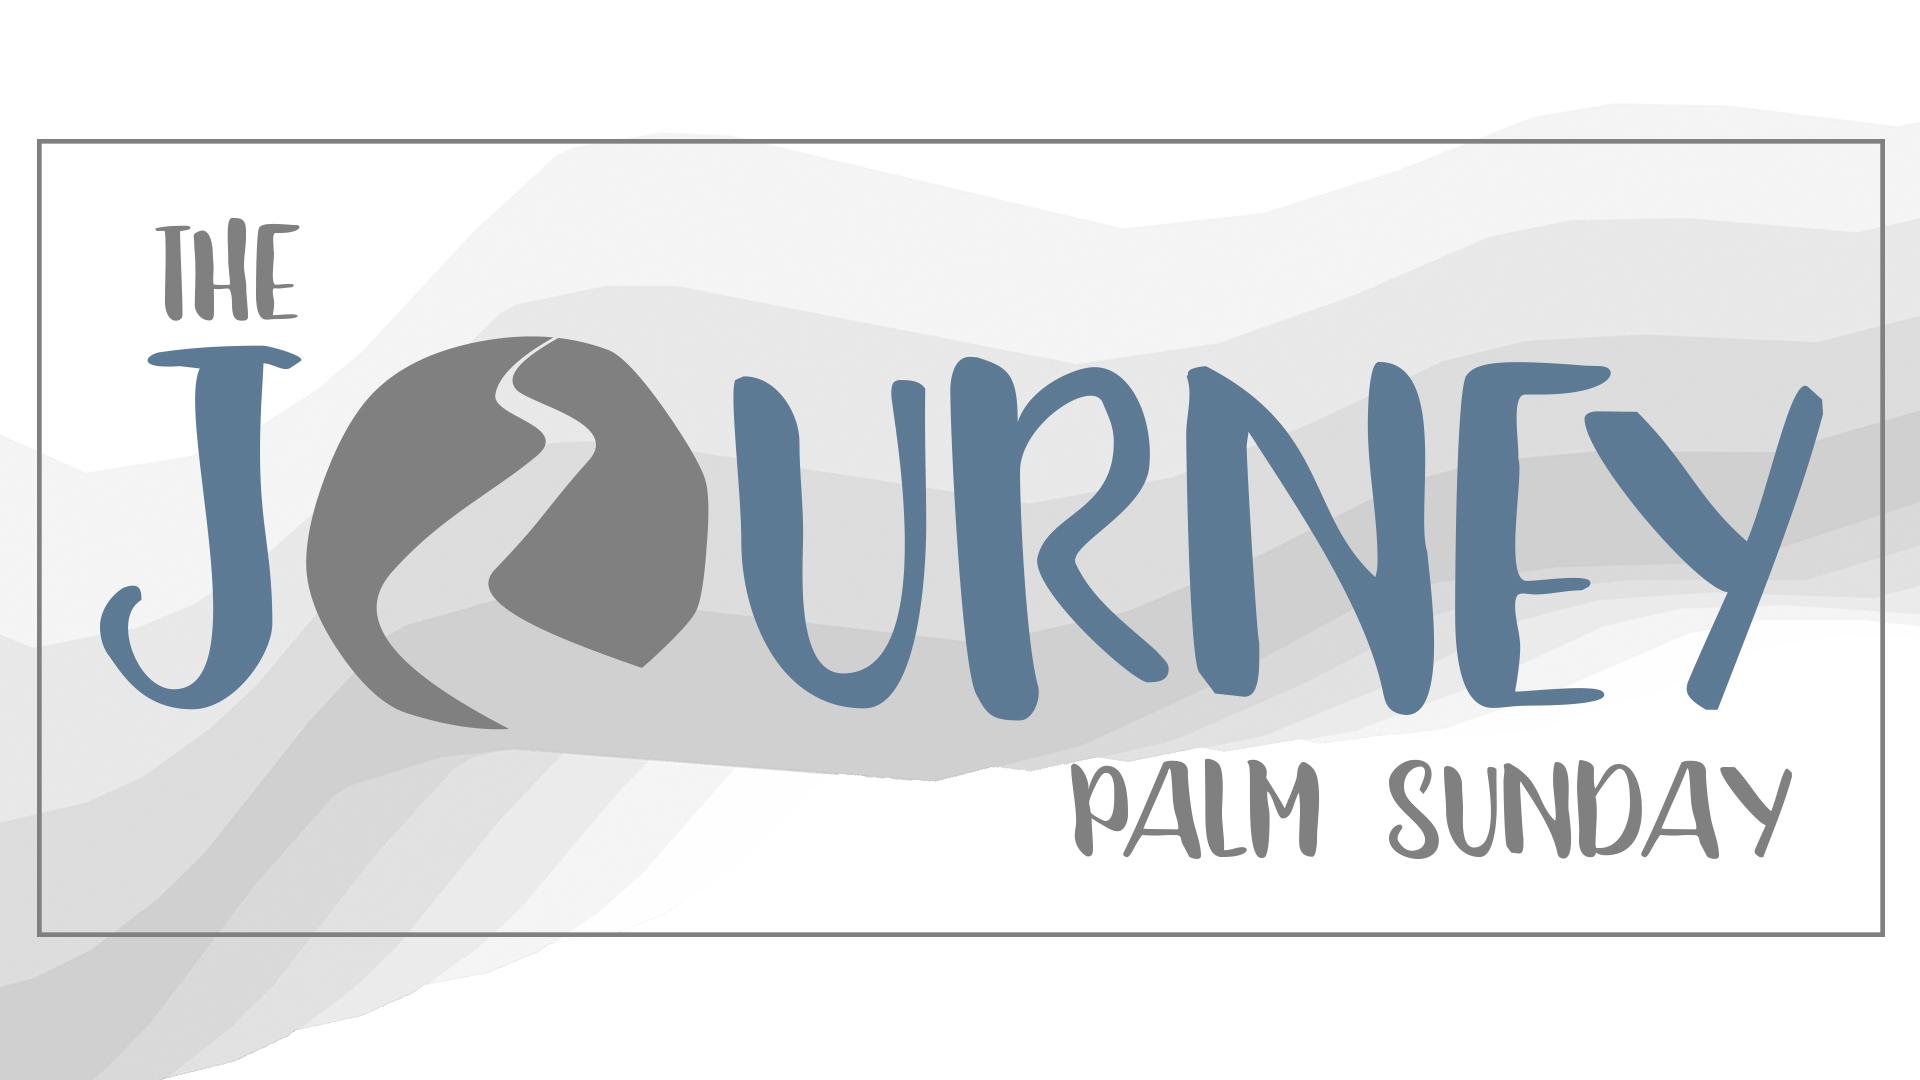 Apr. 9 – Palm Sunday